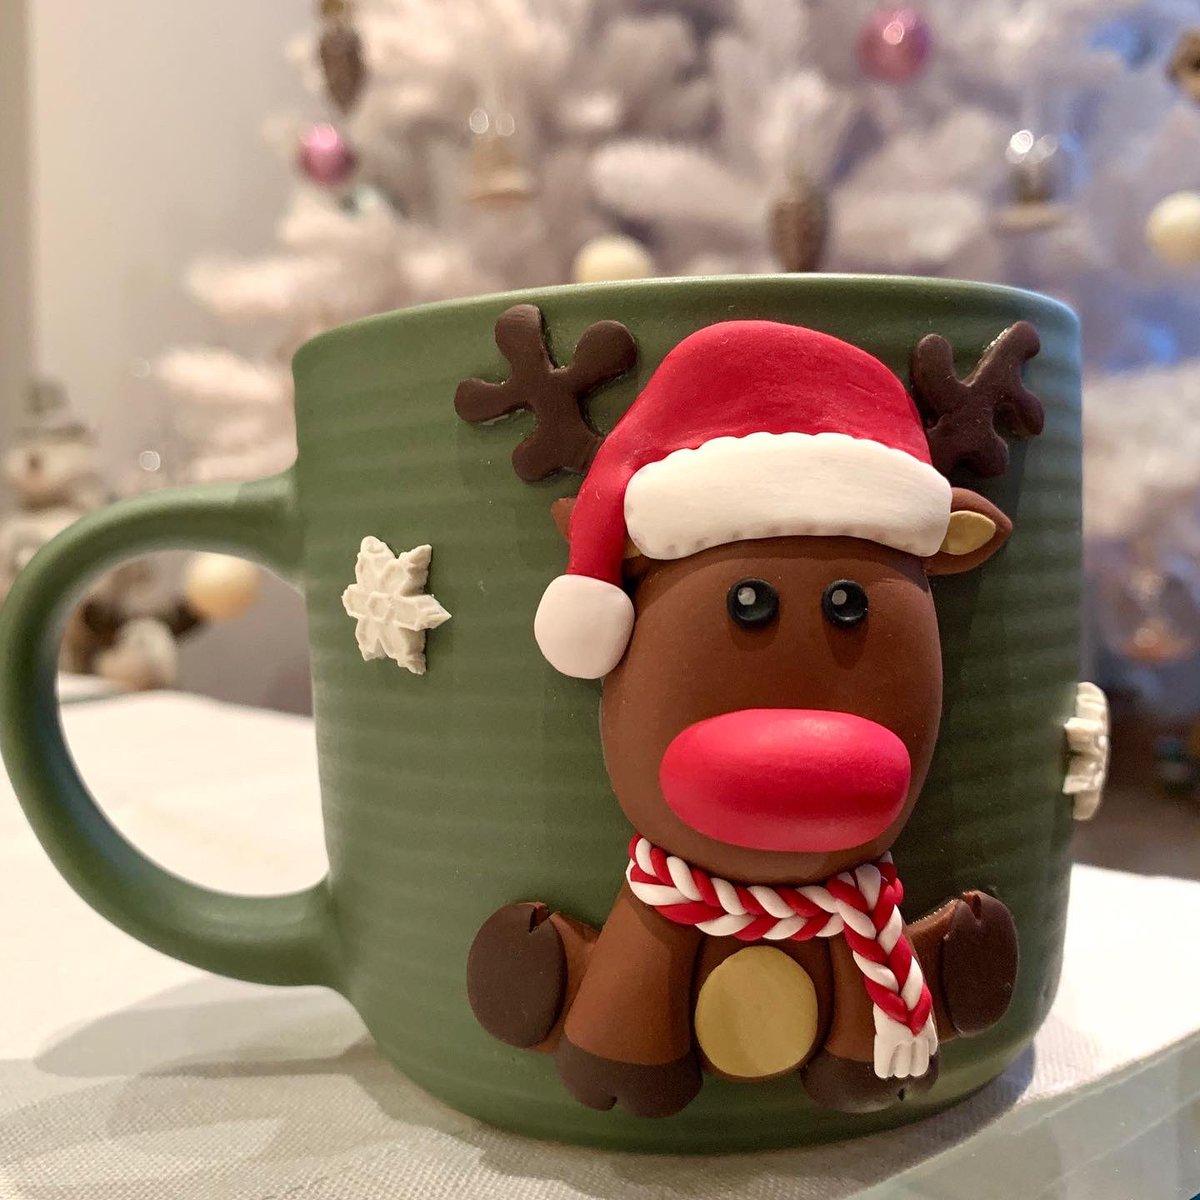 Taza #Rudolph #rudolphtherednosedreindeer realizada con arcilla polimerica #fimo